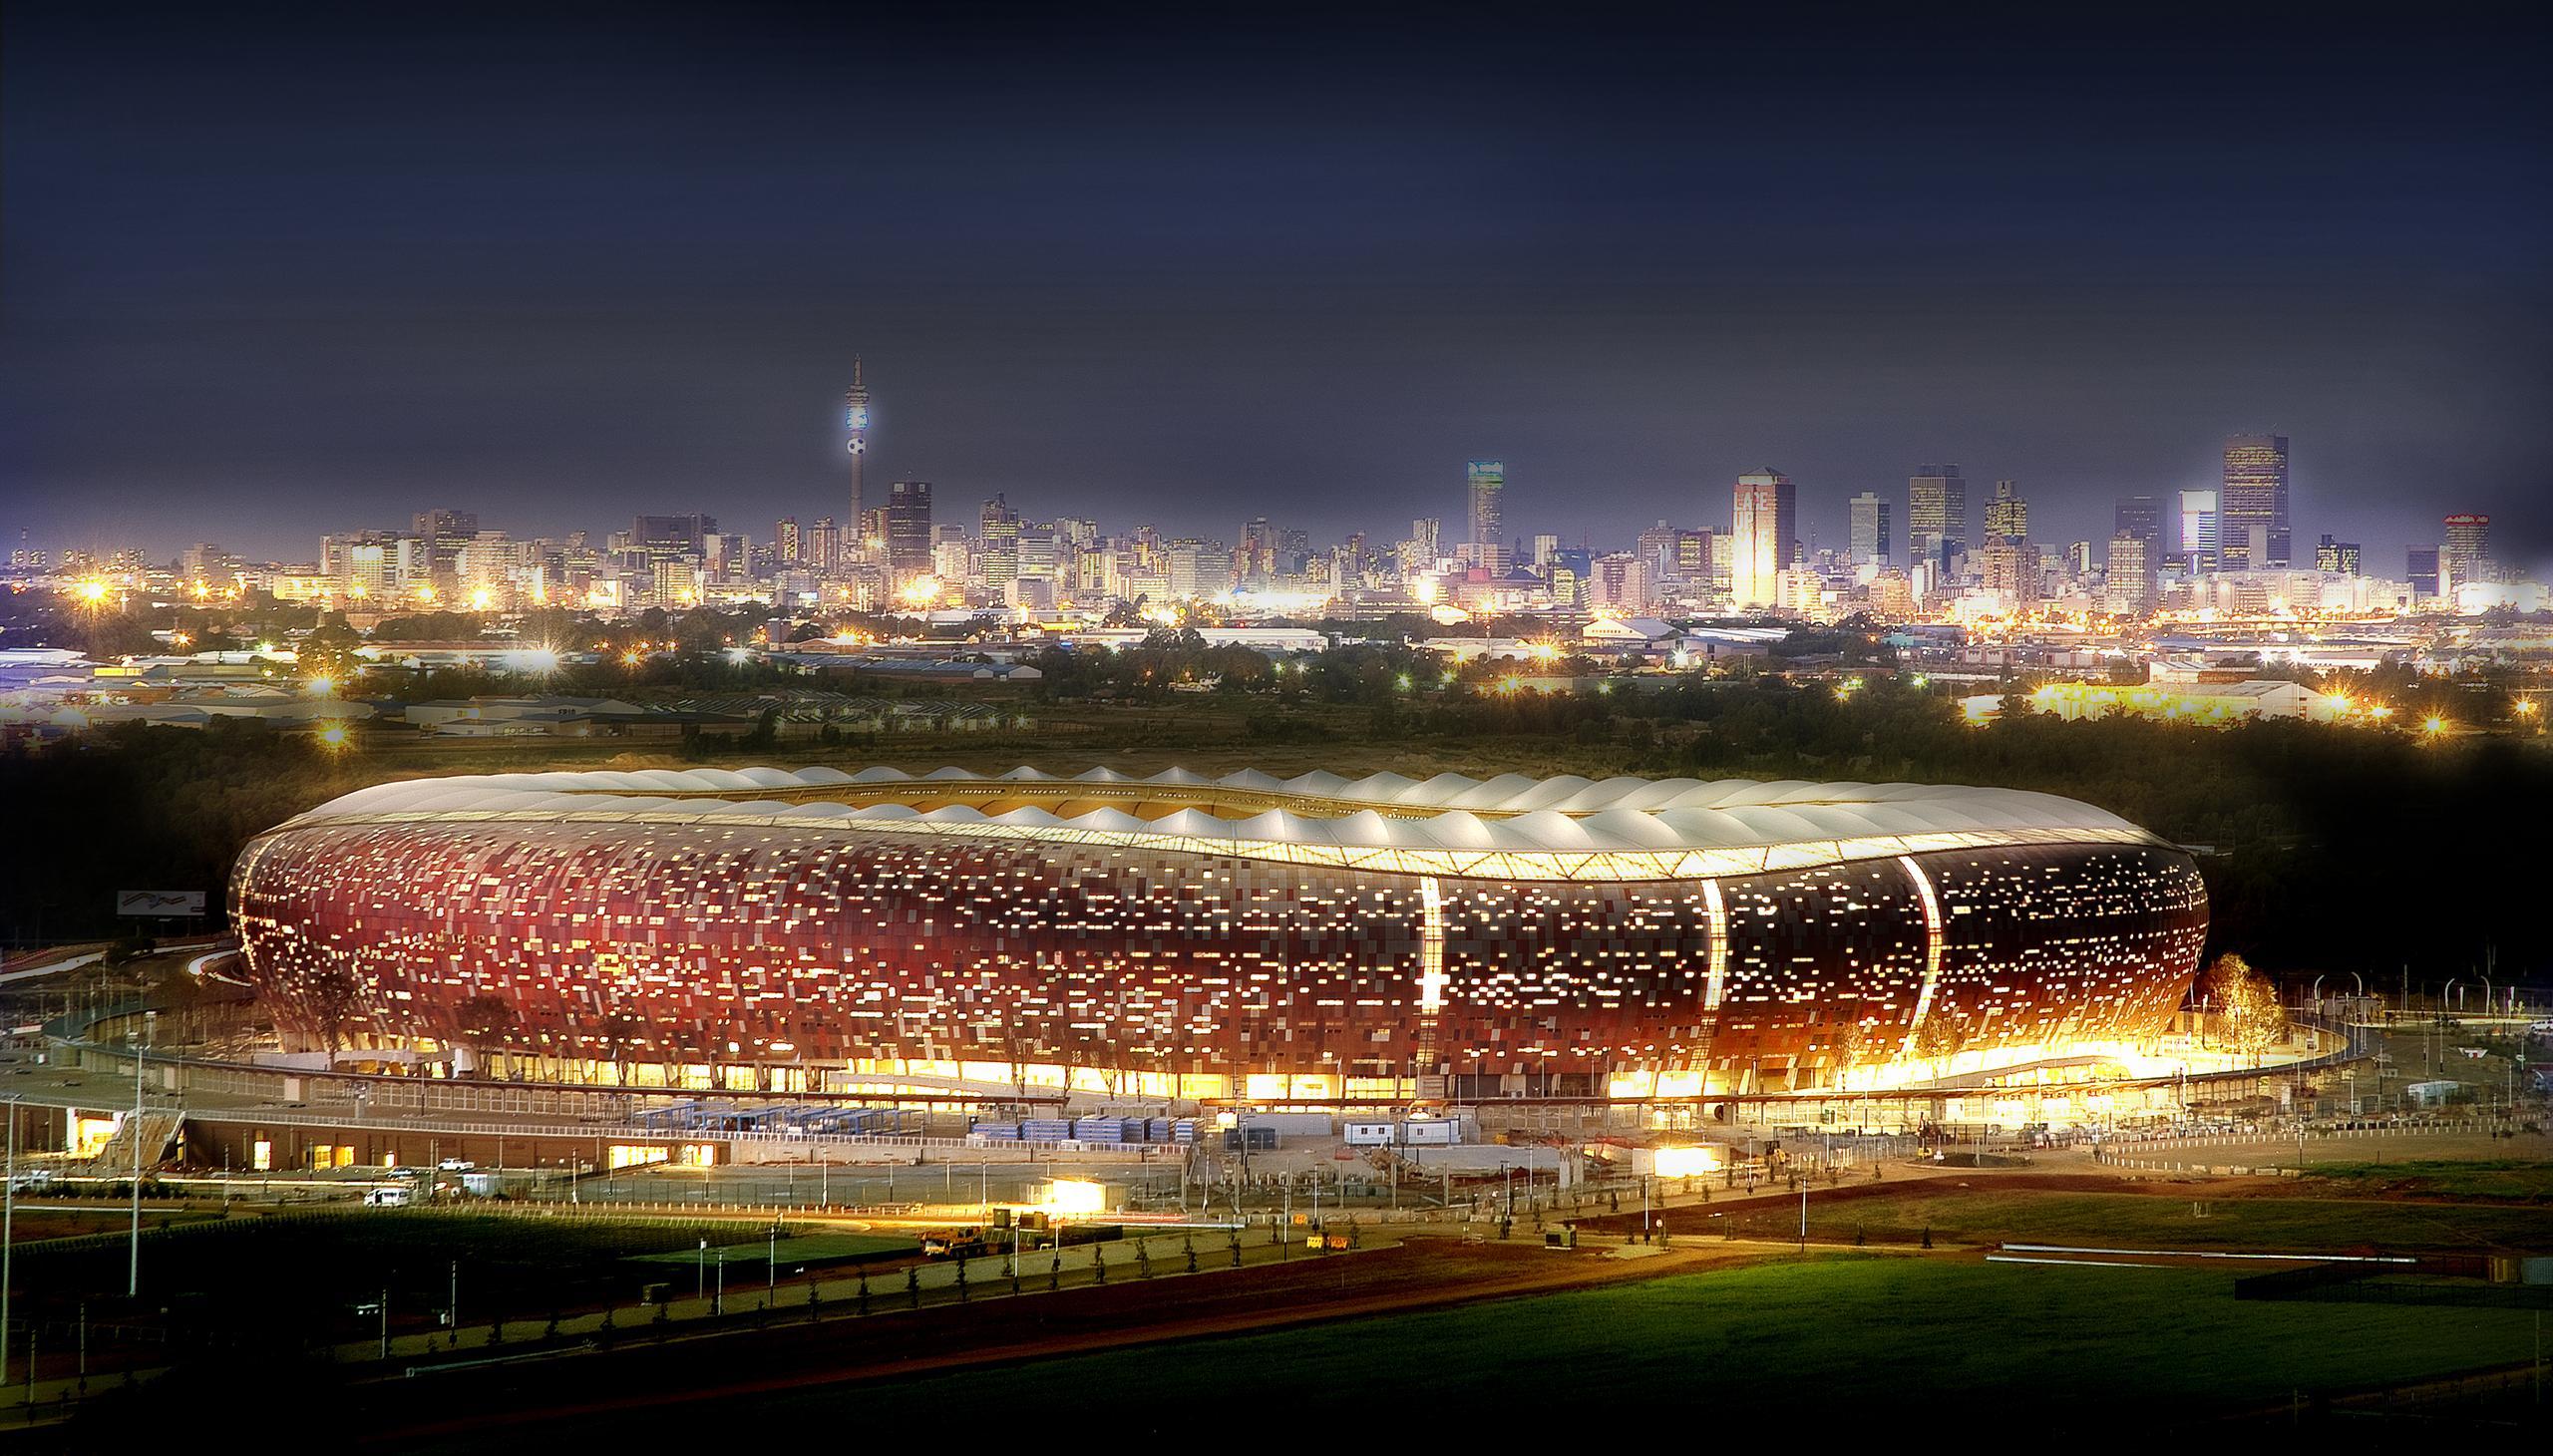 Soccer_City_FNB Stadium 03-2010-162 nite2cropped copy (1)